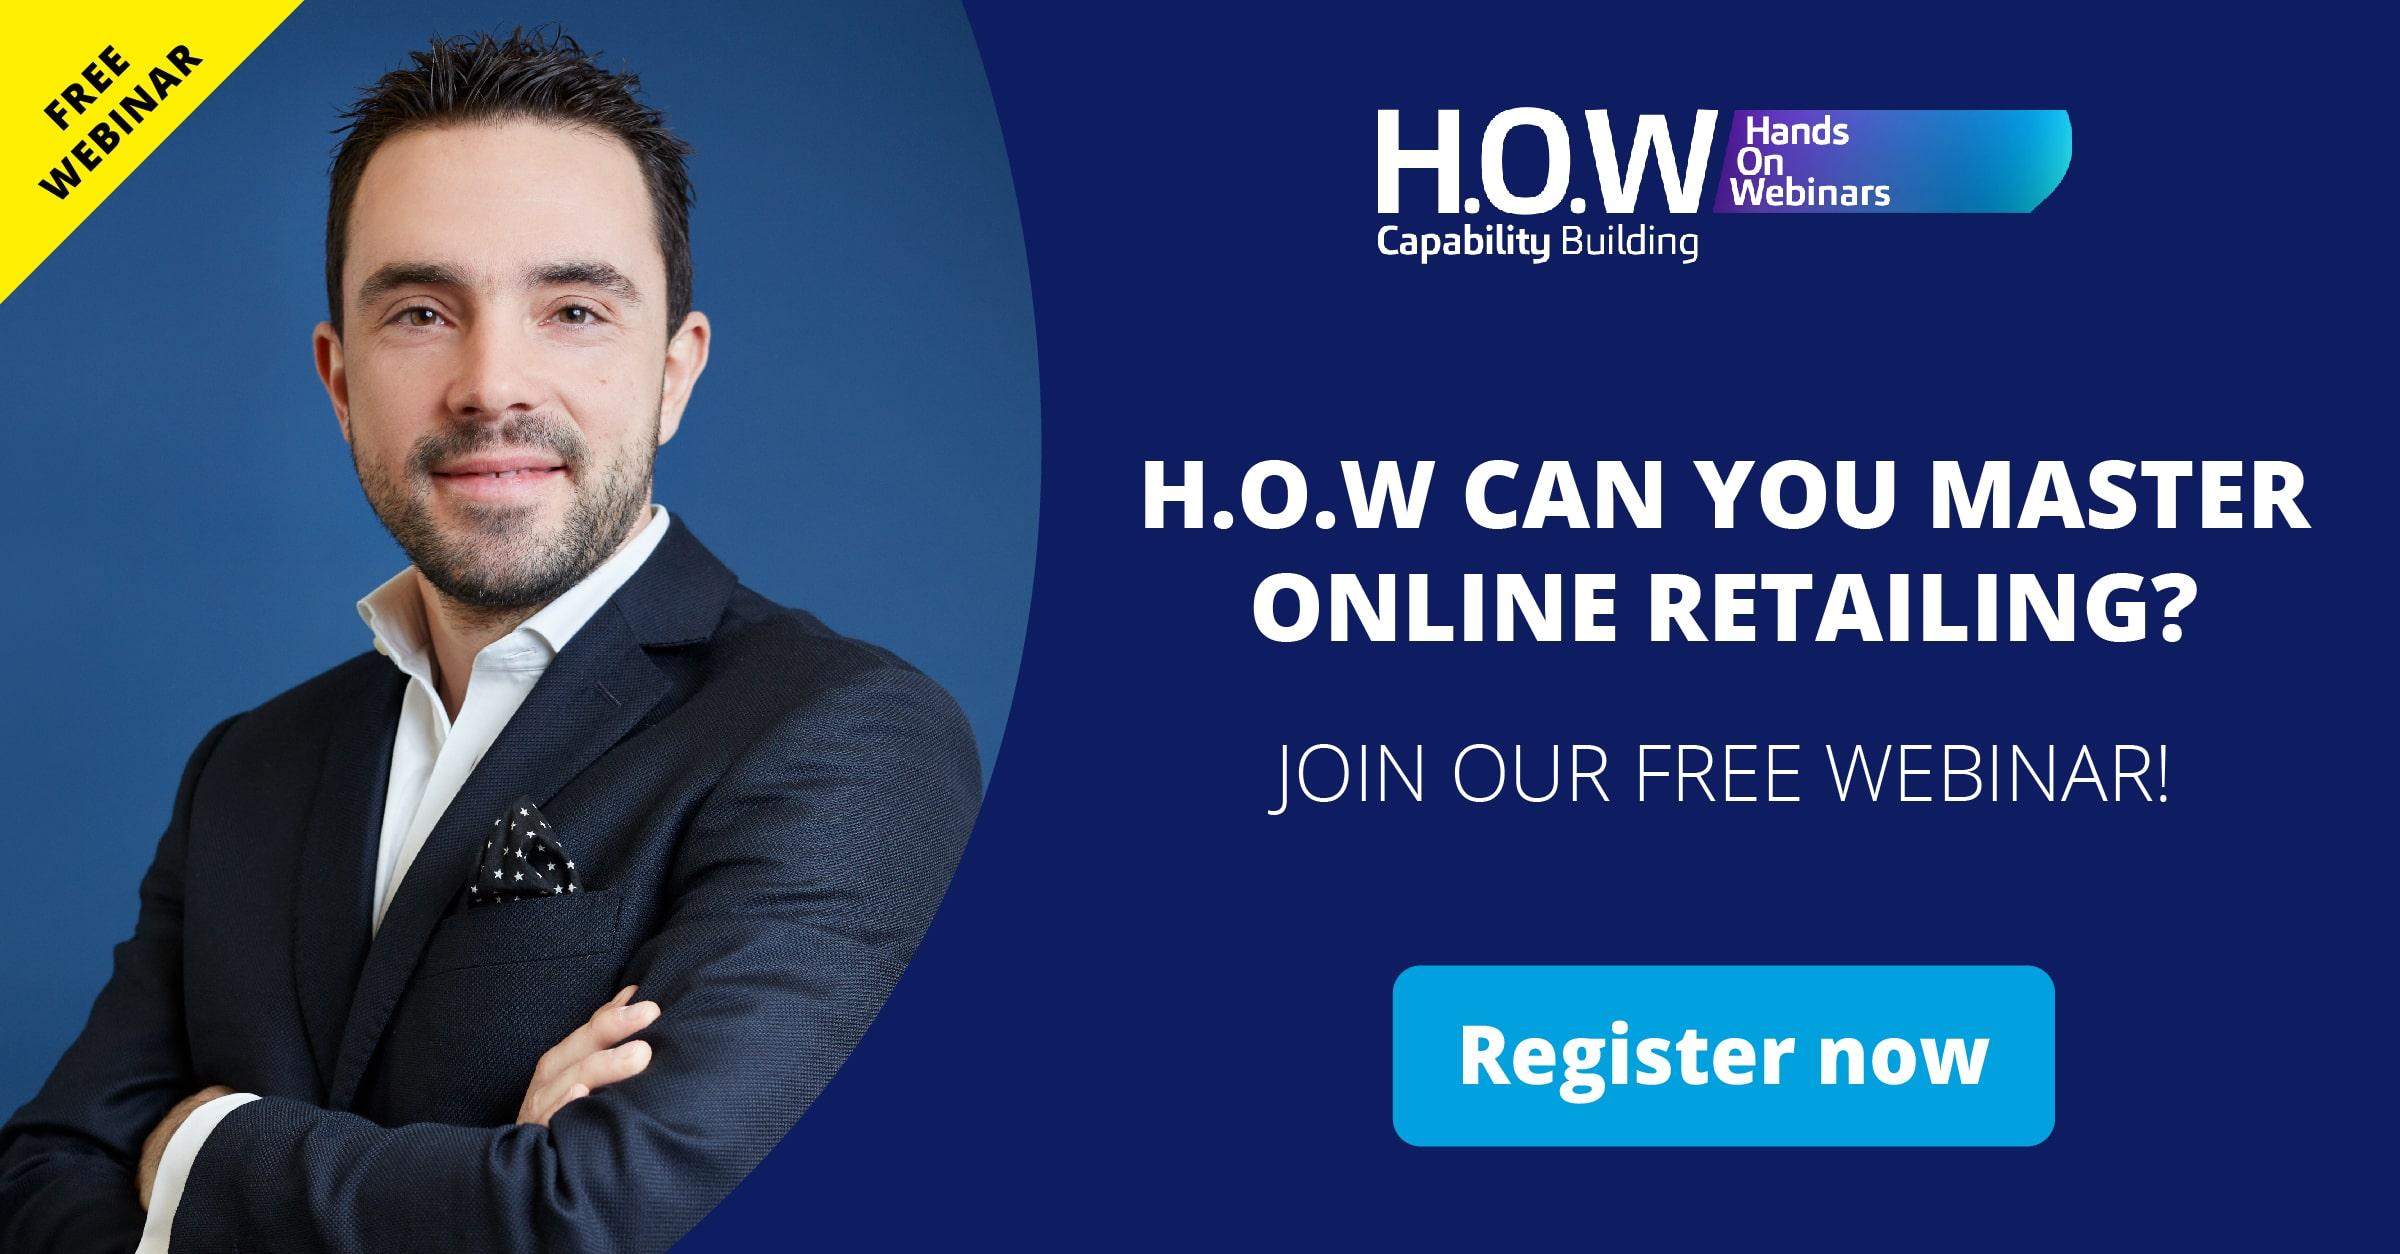 Trainer Niko Voutselas H.O.W to Master Online Retailing? free webinar